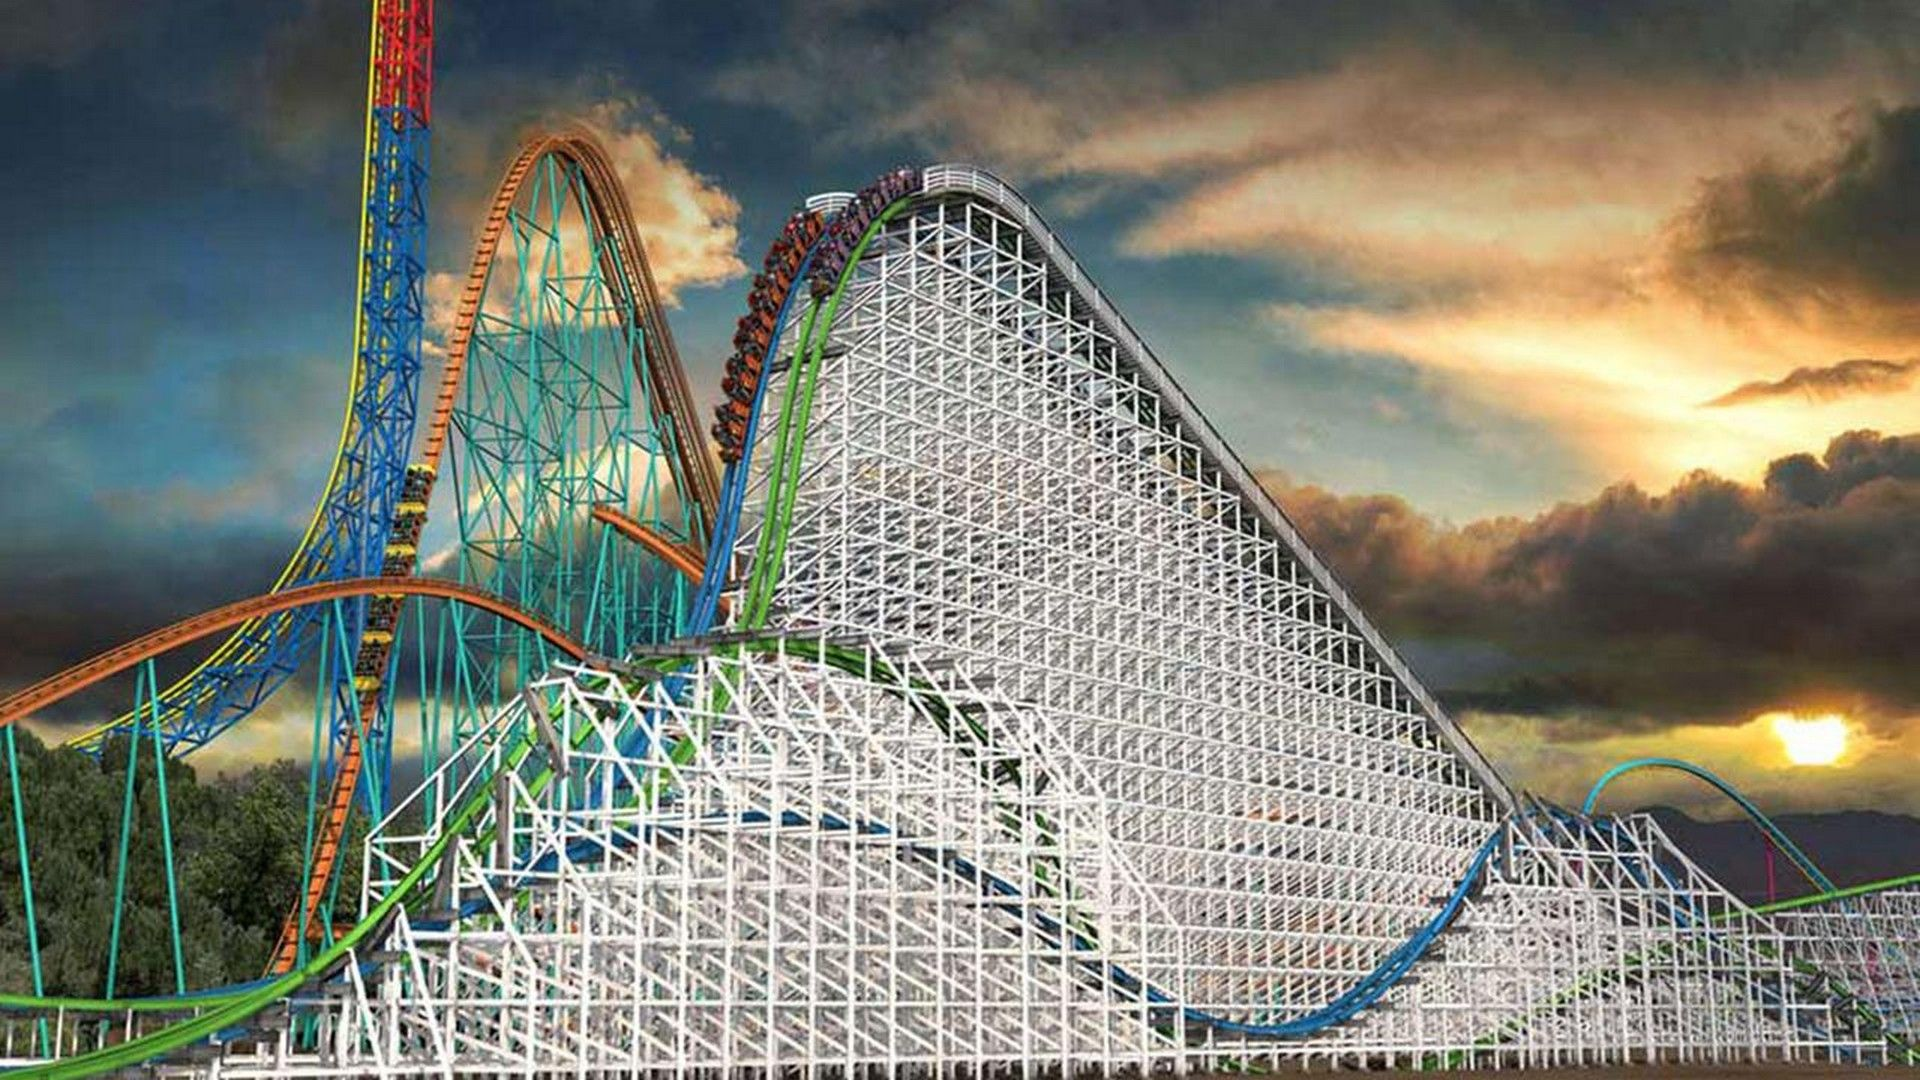 Hd Six Flags Magic Mountain Wallpaper New Roller Coaster Crazy Roller Coaster Scary Roller Coasters